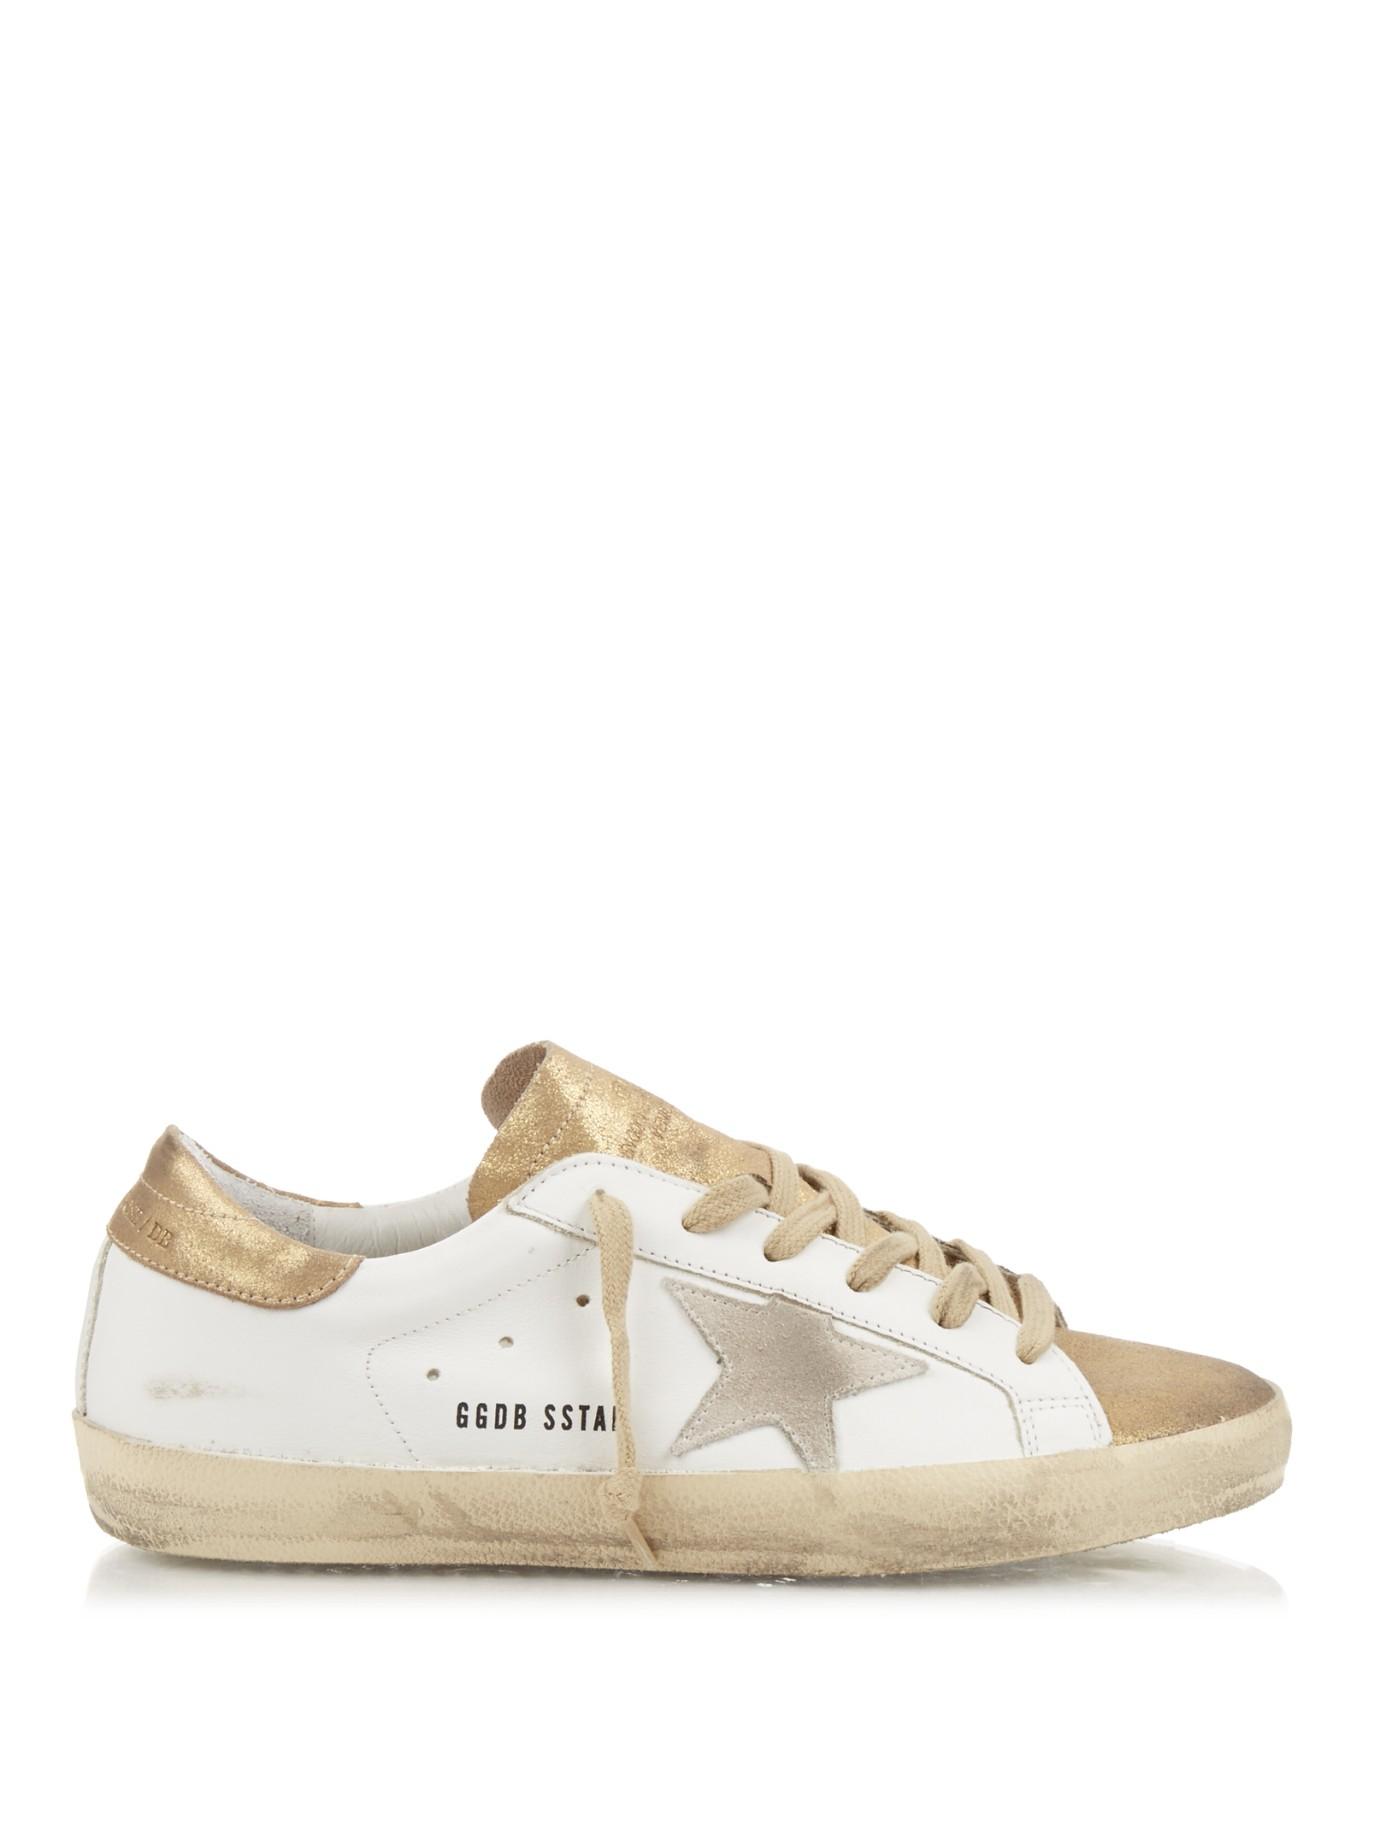 Golden Goose Deluxe Brand Super Star